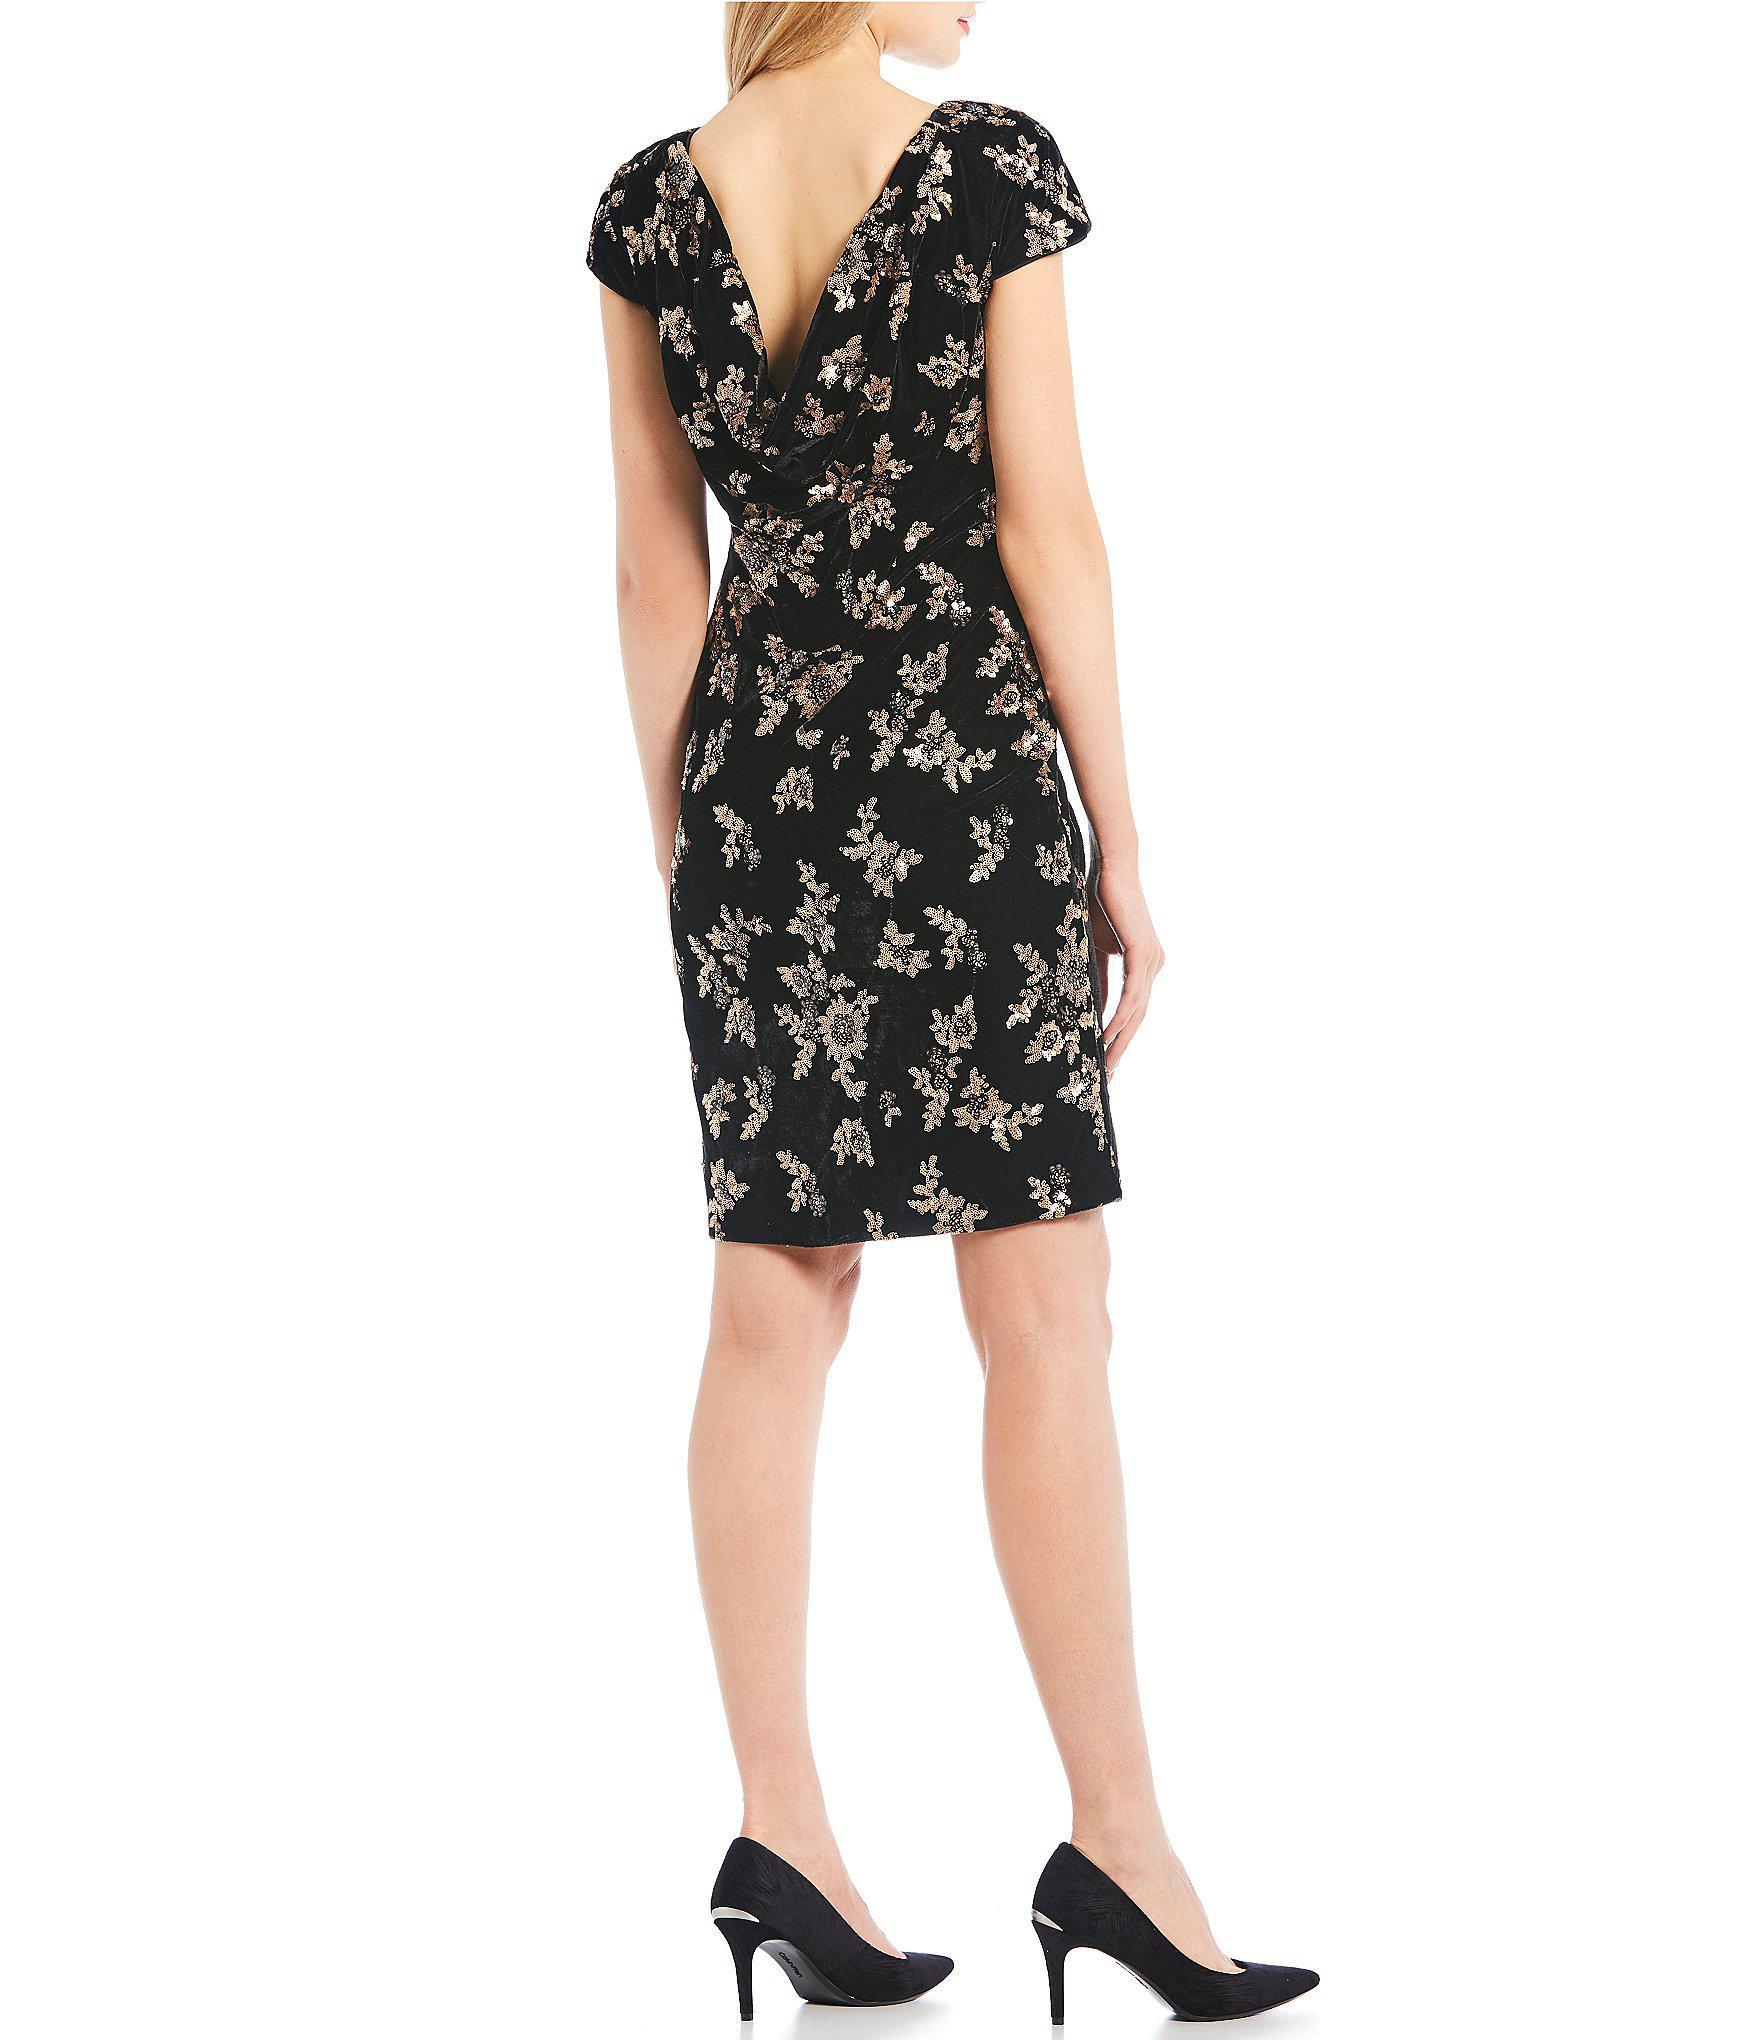 496731ccda2 Calvin Klein - Black Sequin Floral Embroidered Velvet Cowl Back Sheath Dress  - Lyst. View fullscreen